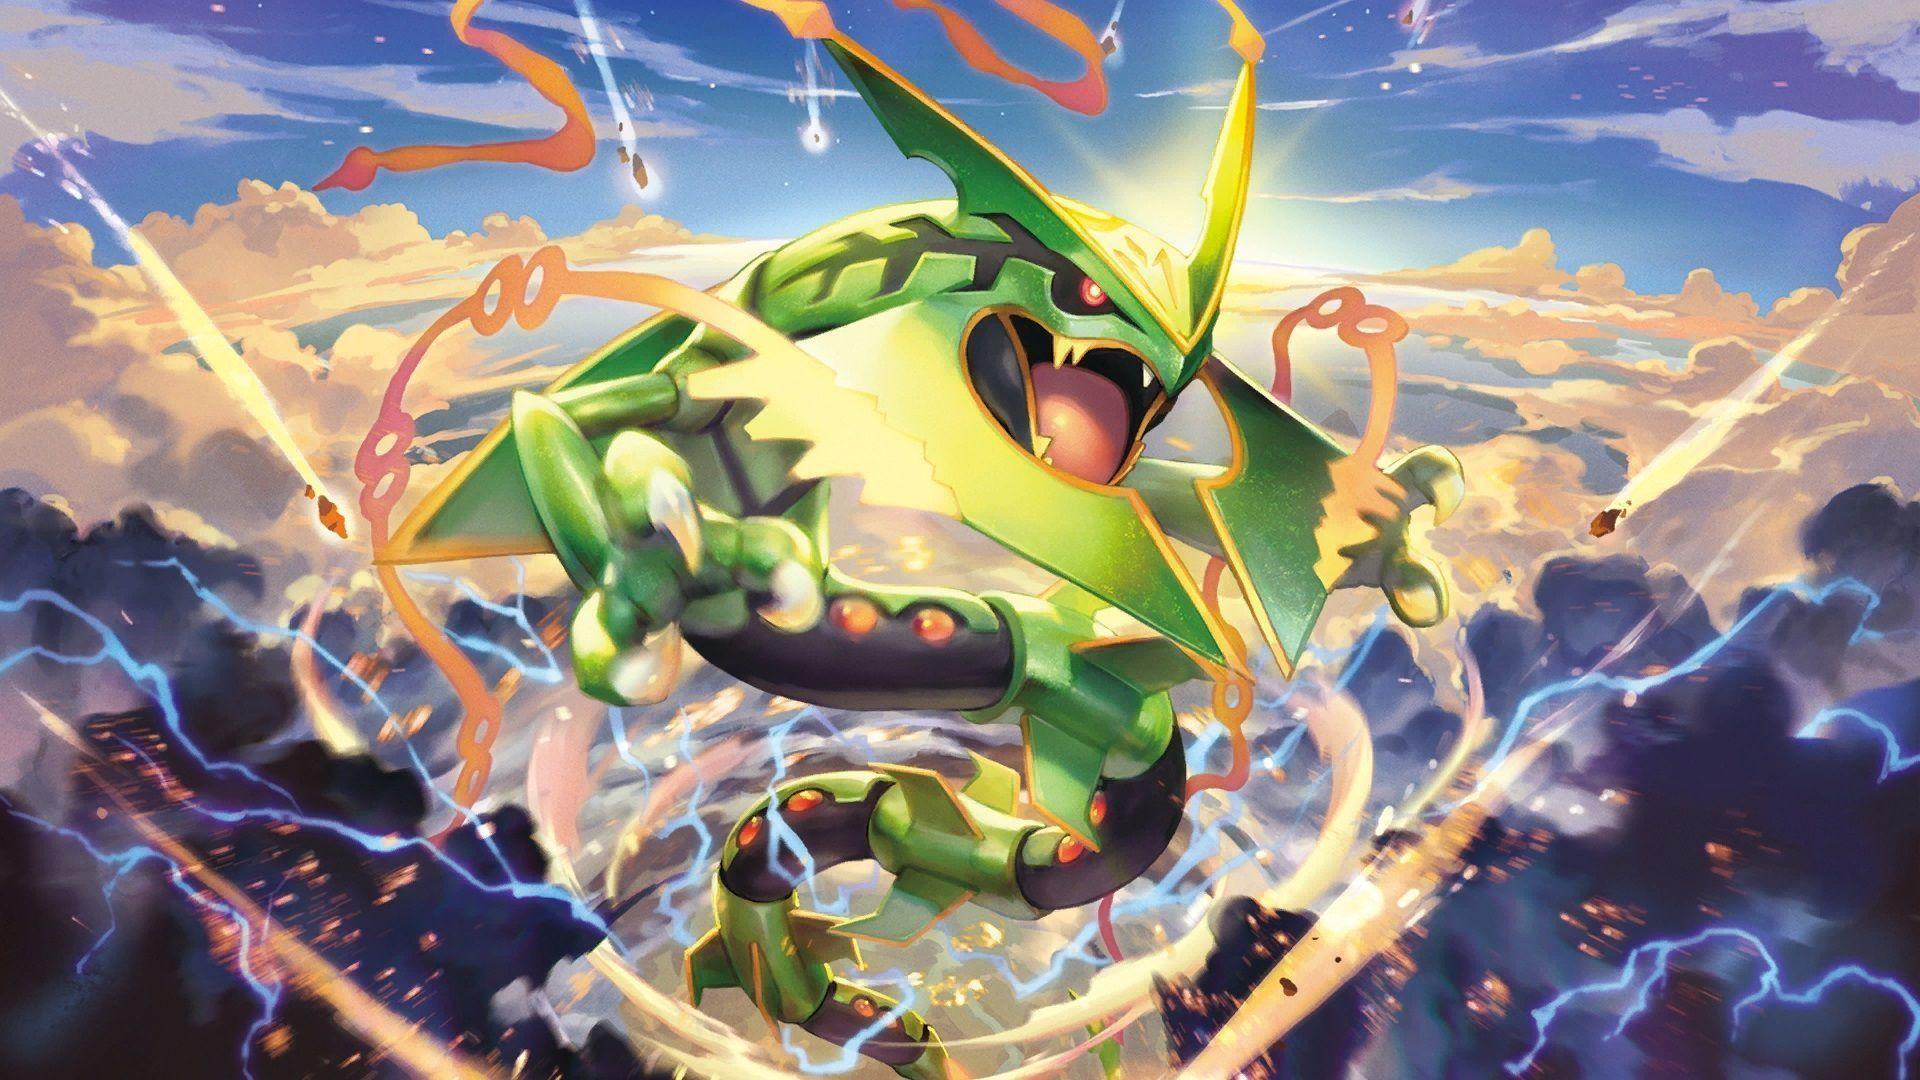 Pokemon Mega Rayquaza Wallpaper, Pokemon Mega Rayquaza Wallpapers .